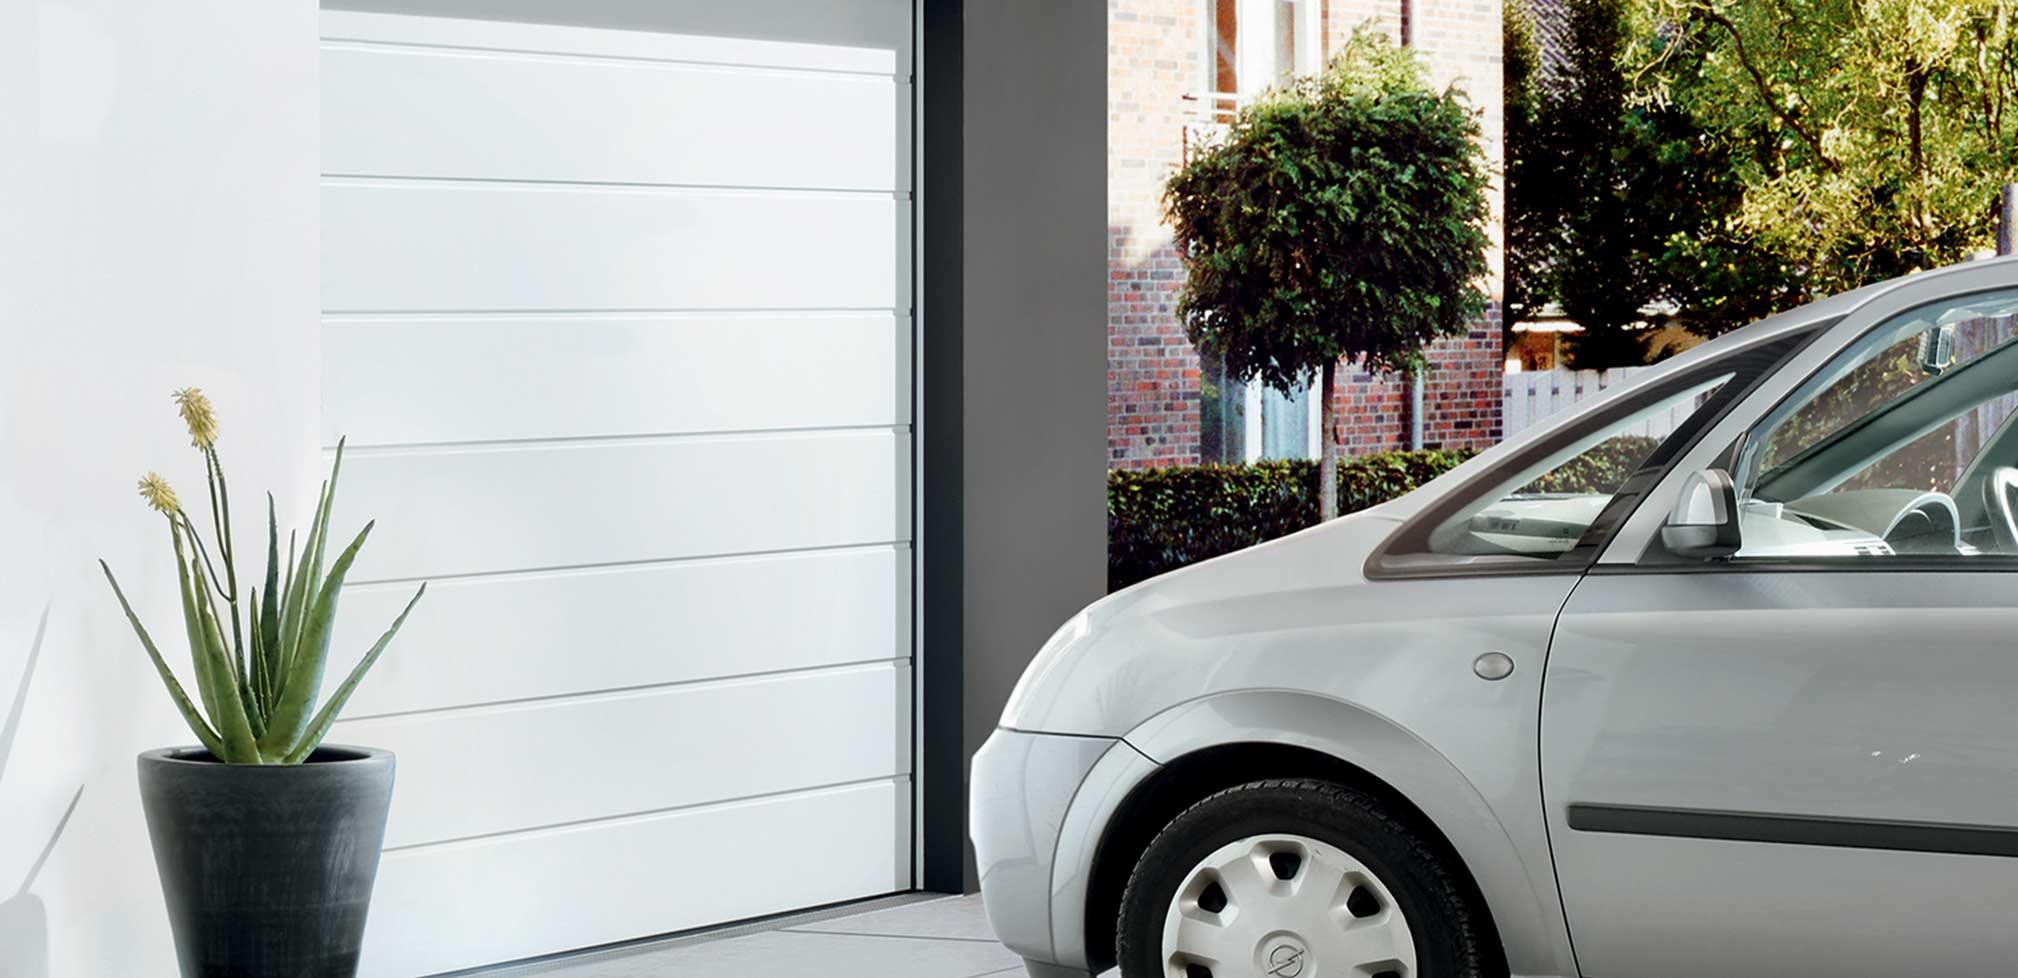 Porte de garage h rmann paris 75005 home garde for Garage mercedes paris 17 rue cardinet